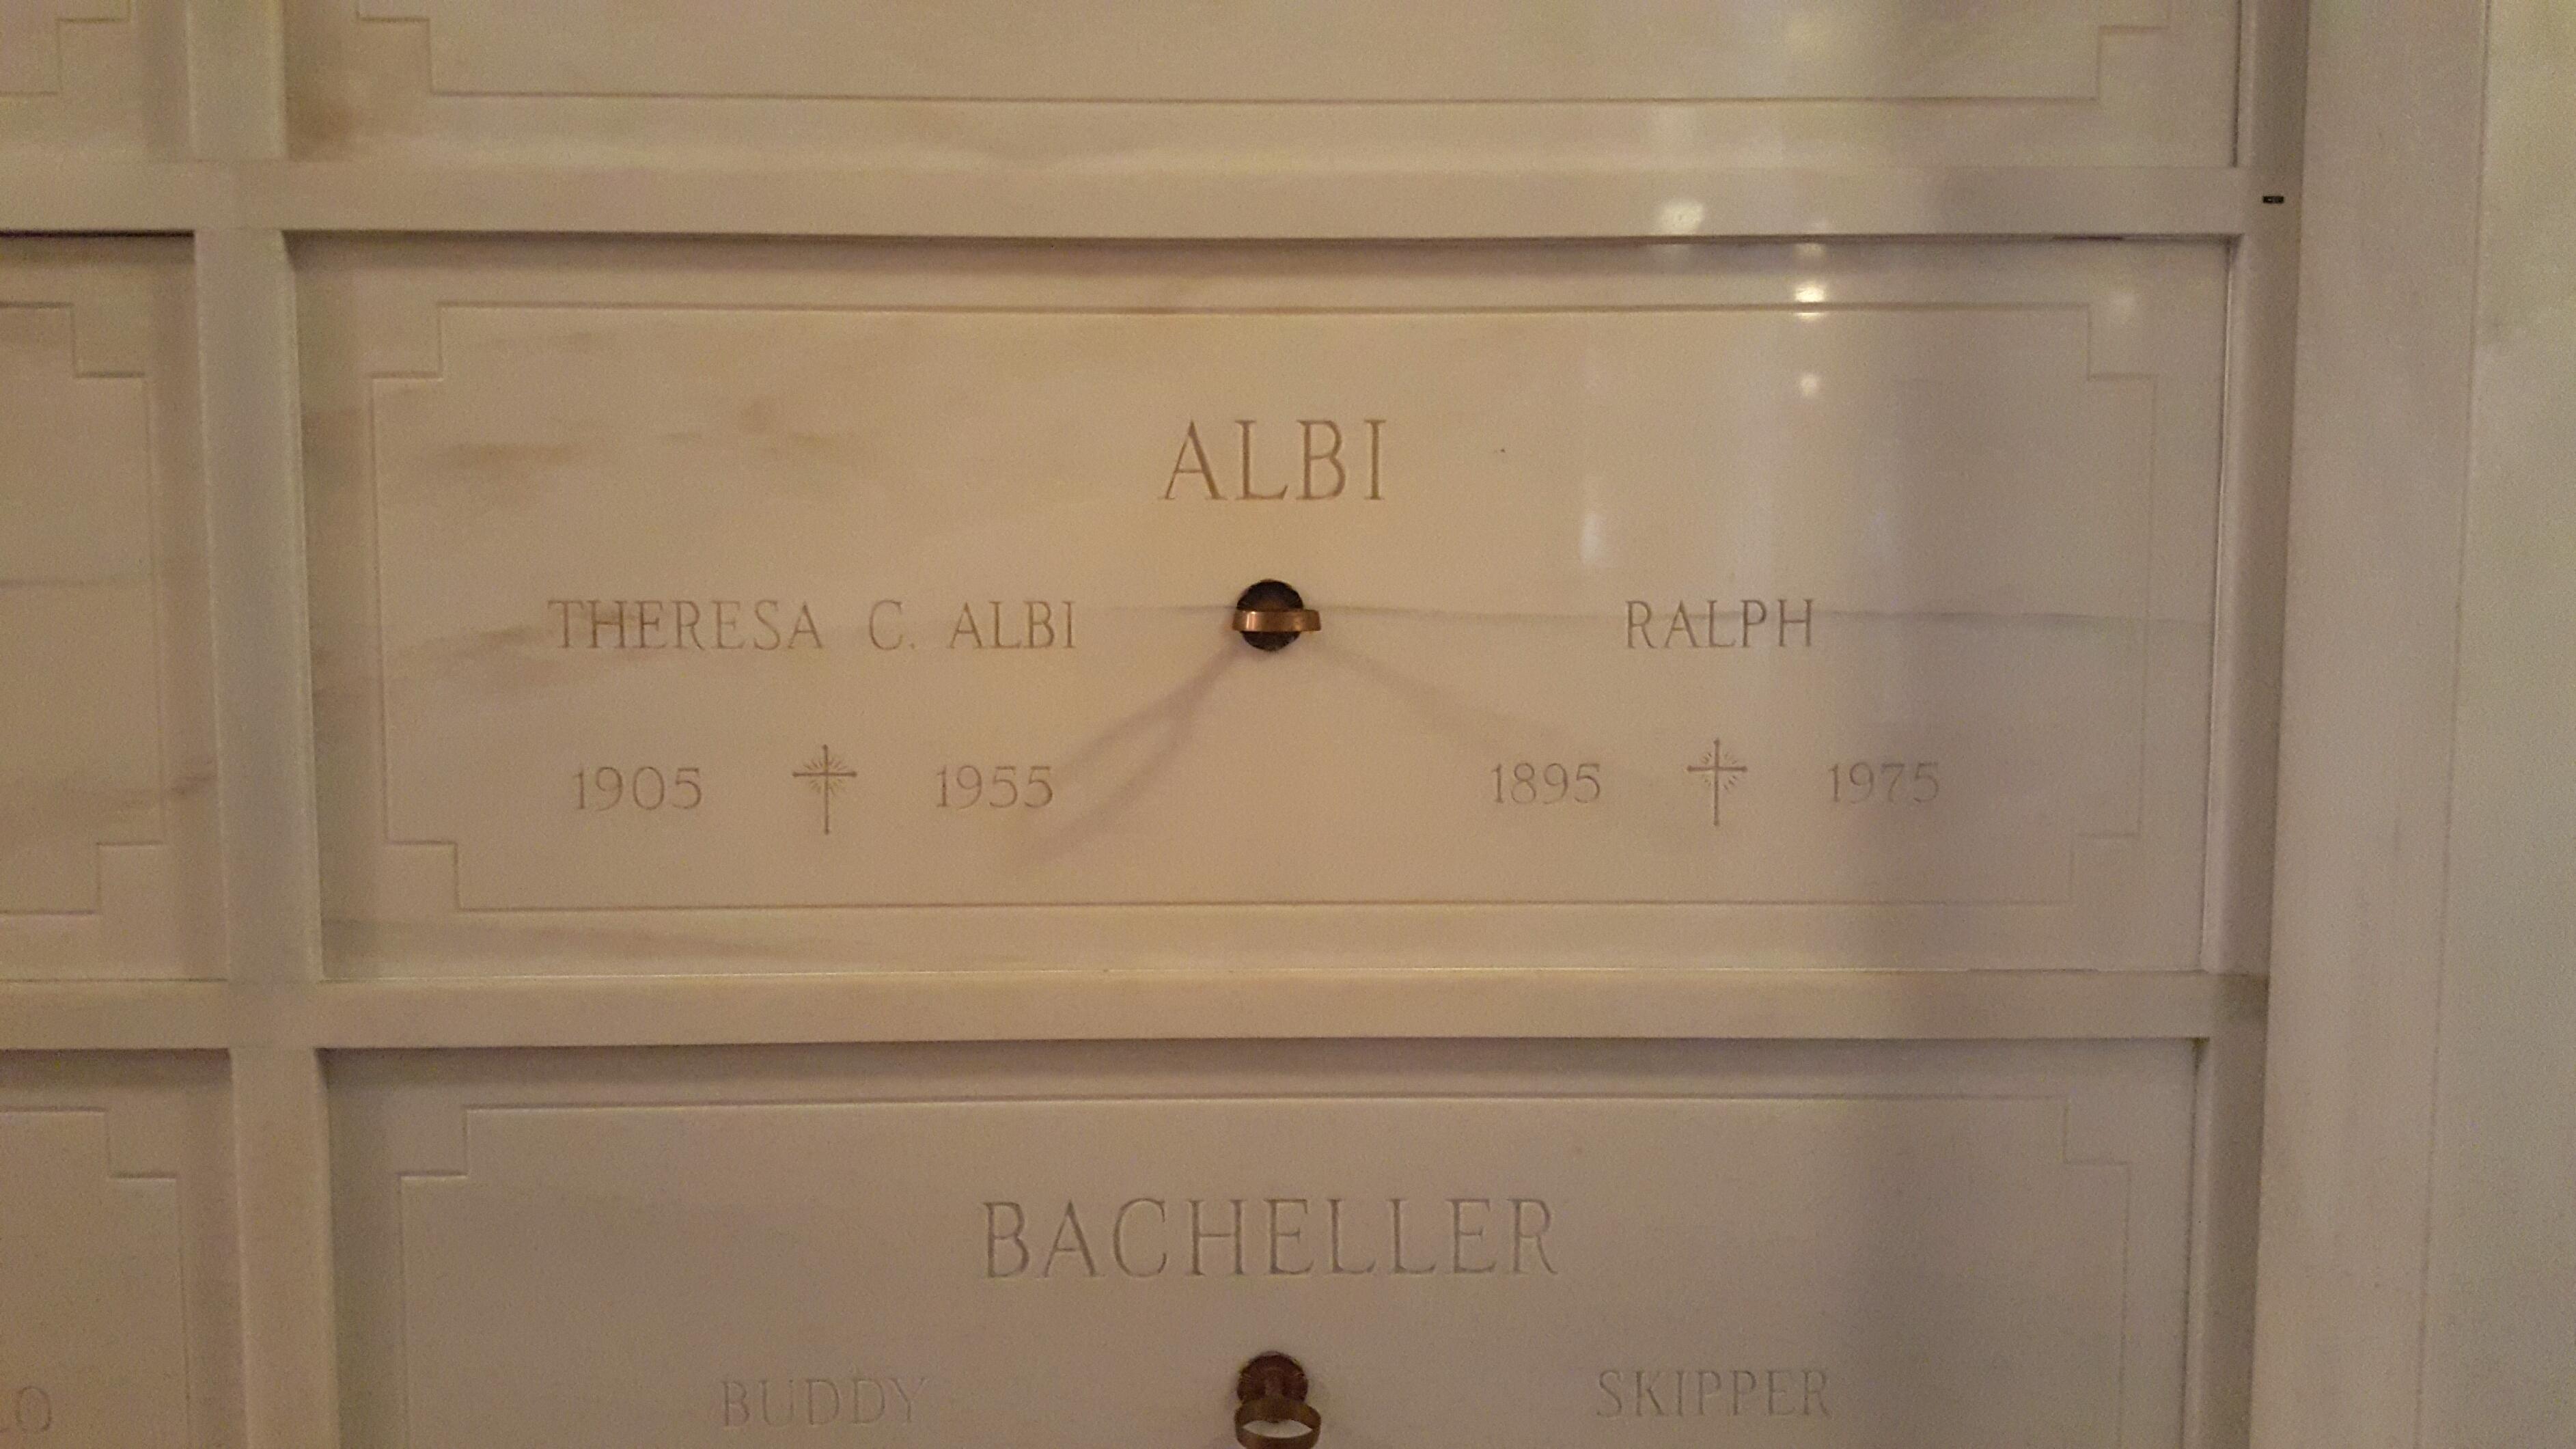 Ralph Albi